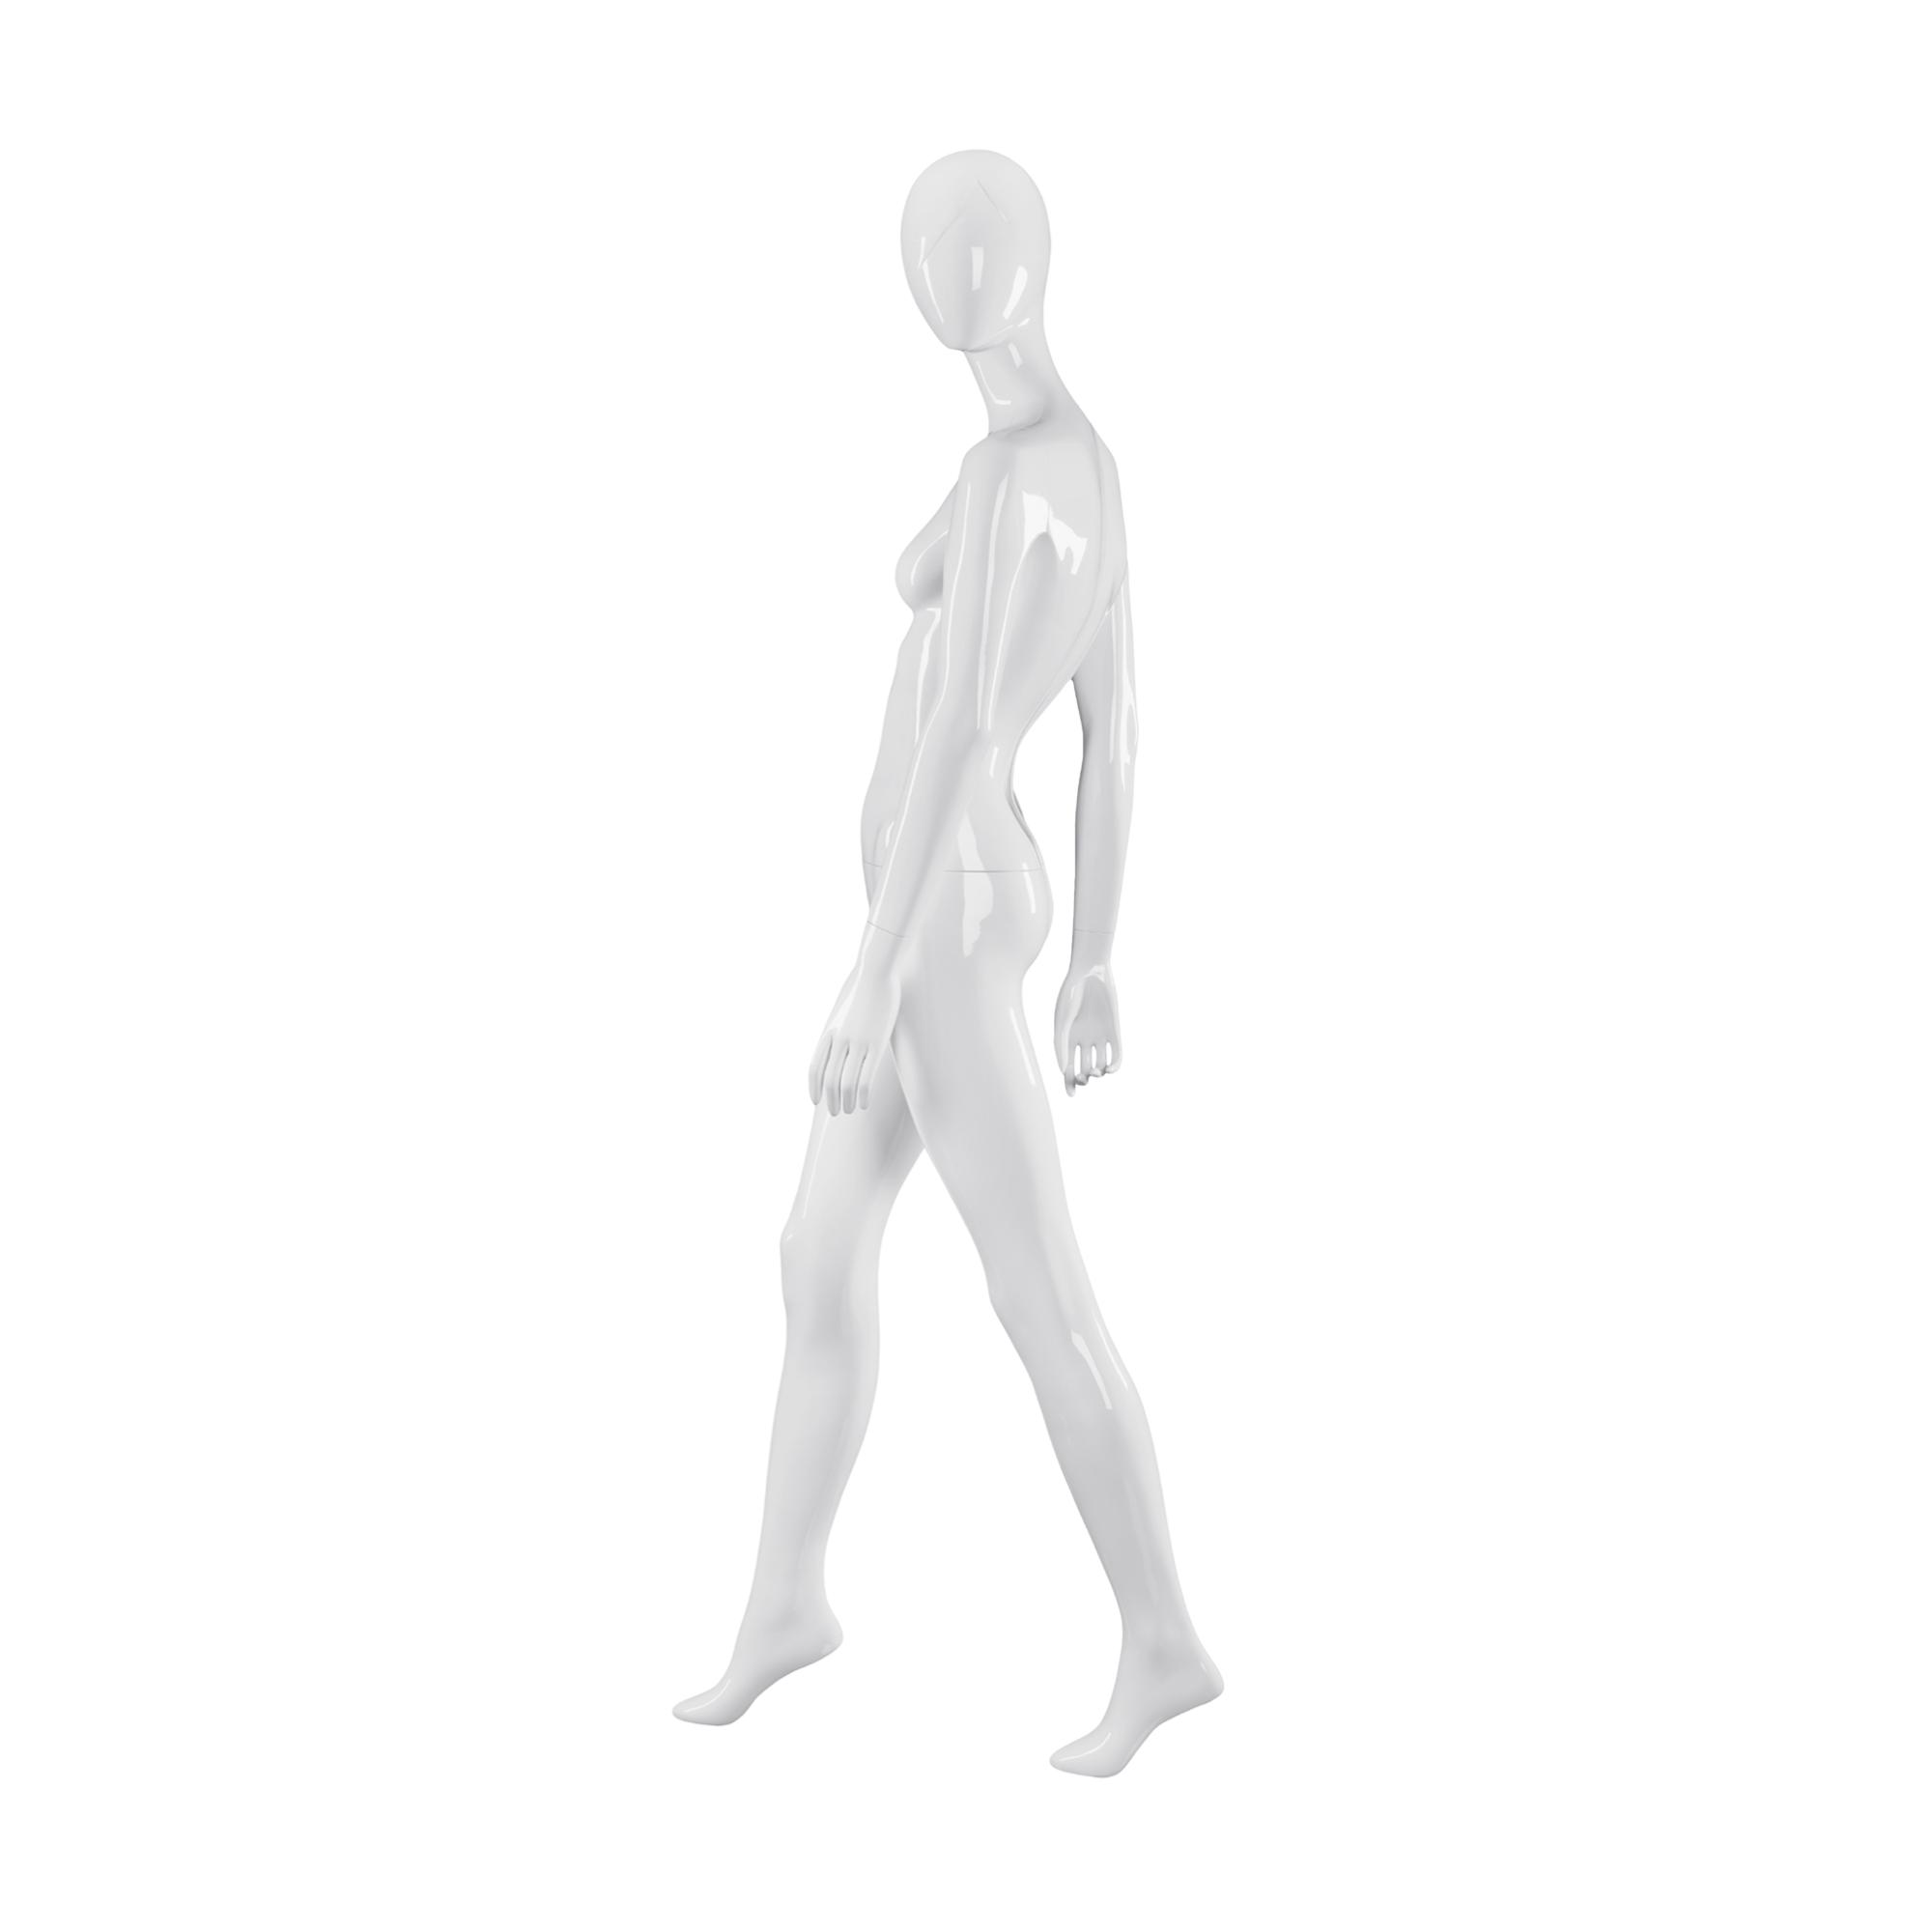 Female Mannequin - Mannequin, Transparent background PNG HD thumbnail